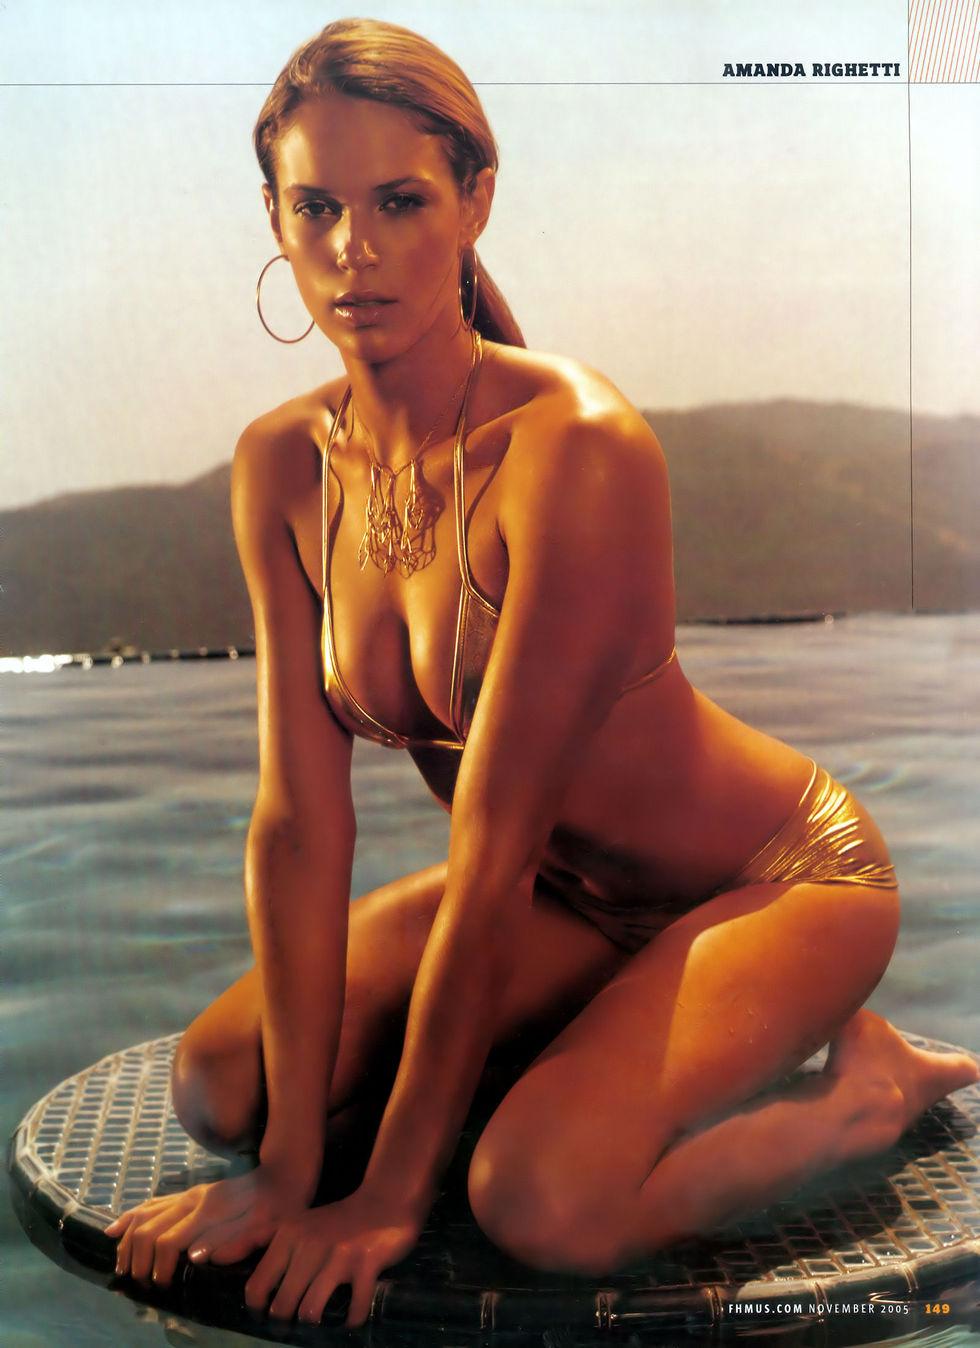 Amanda Righetti Hot Pics   Celebrity Hot Wallpapers And Photos